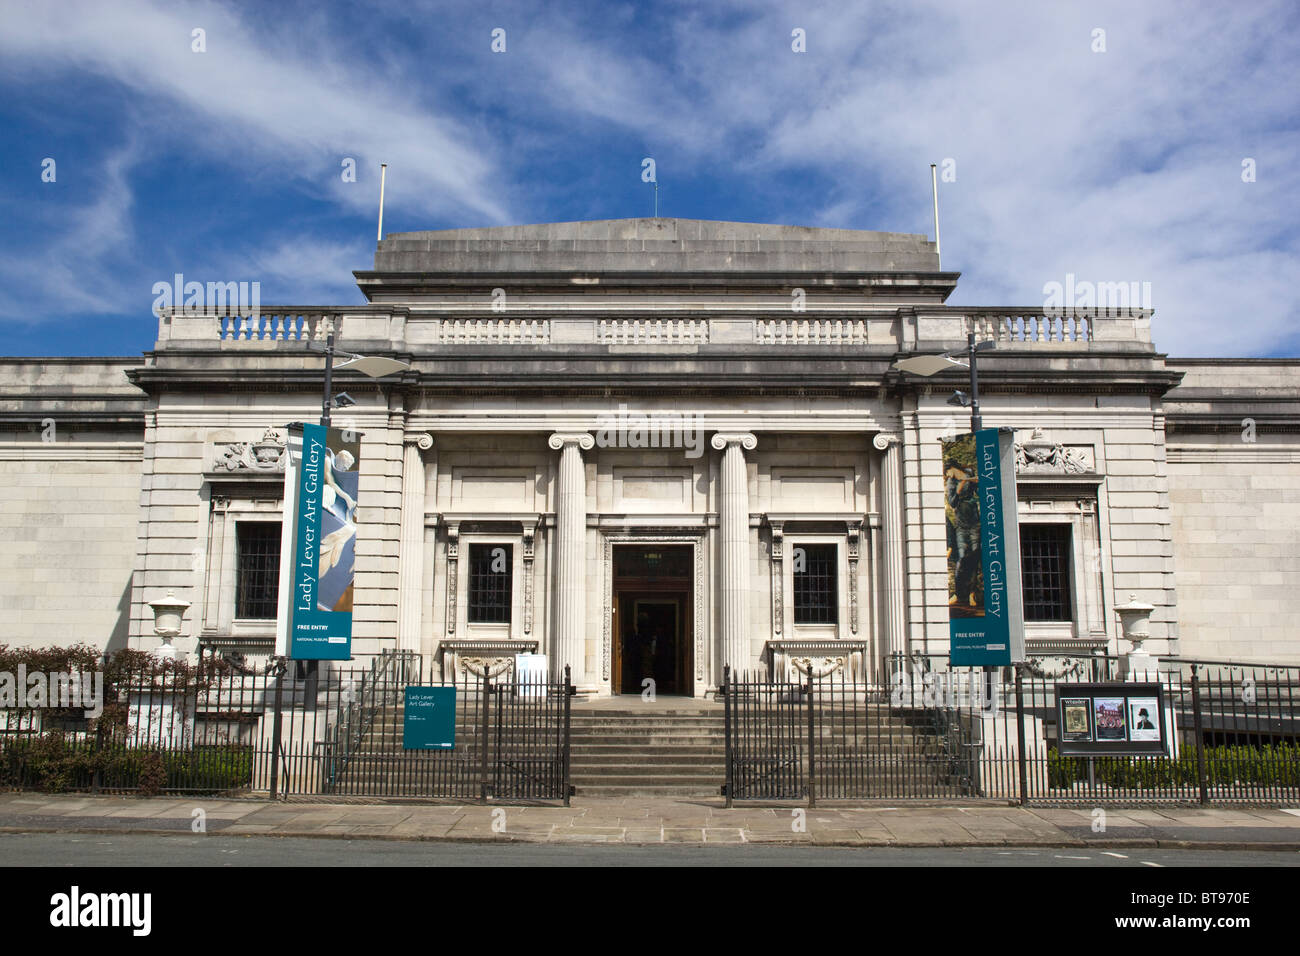 Lady Lever Art Gallery Port Sunlight - Stock Image